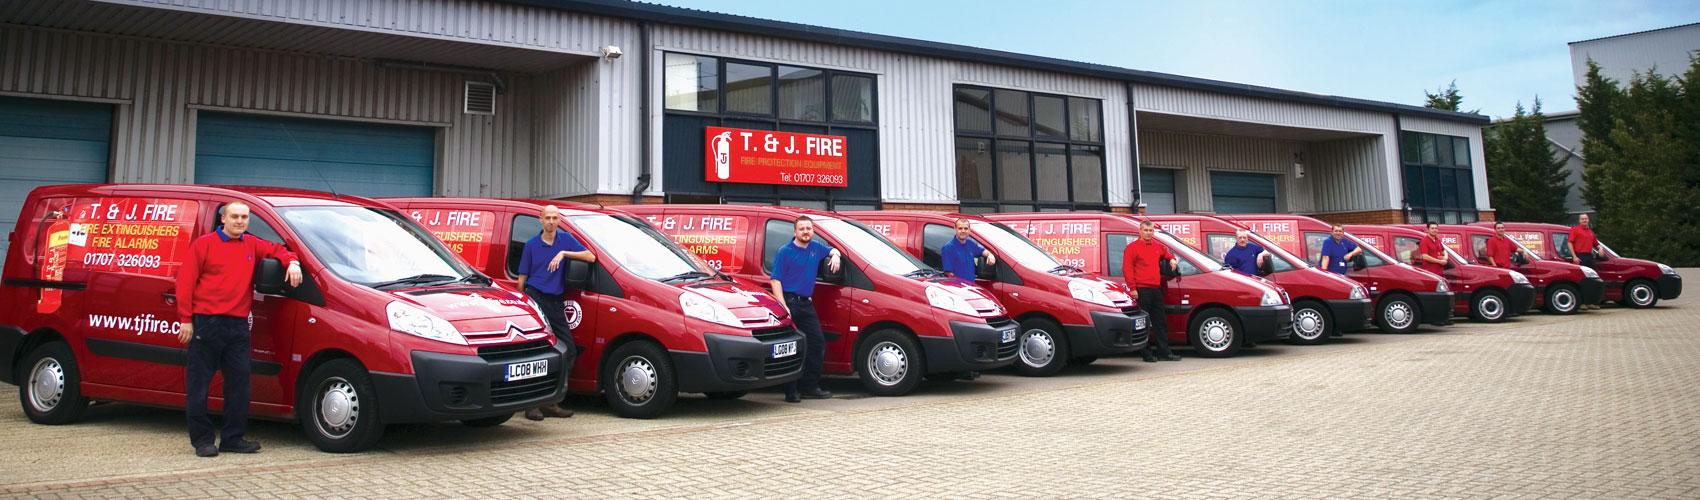 T&J Fire Vans